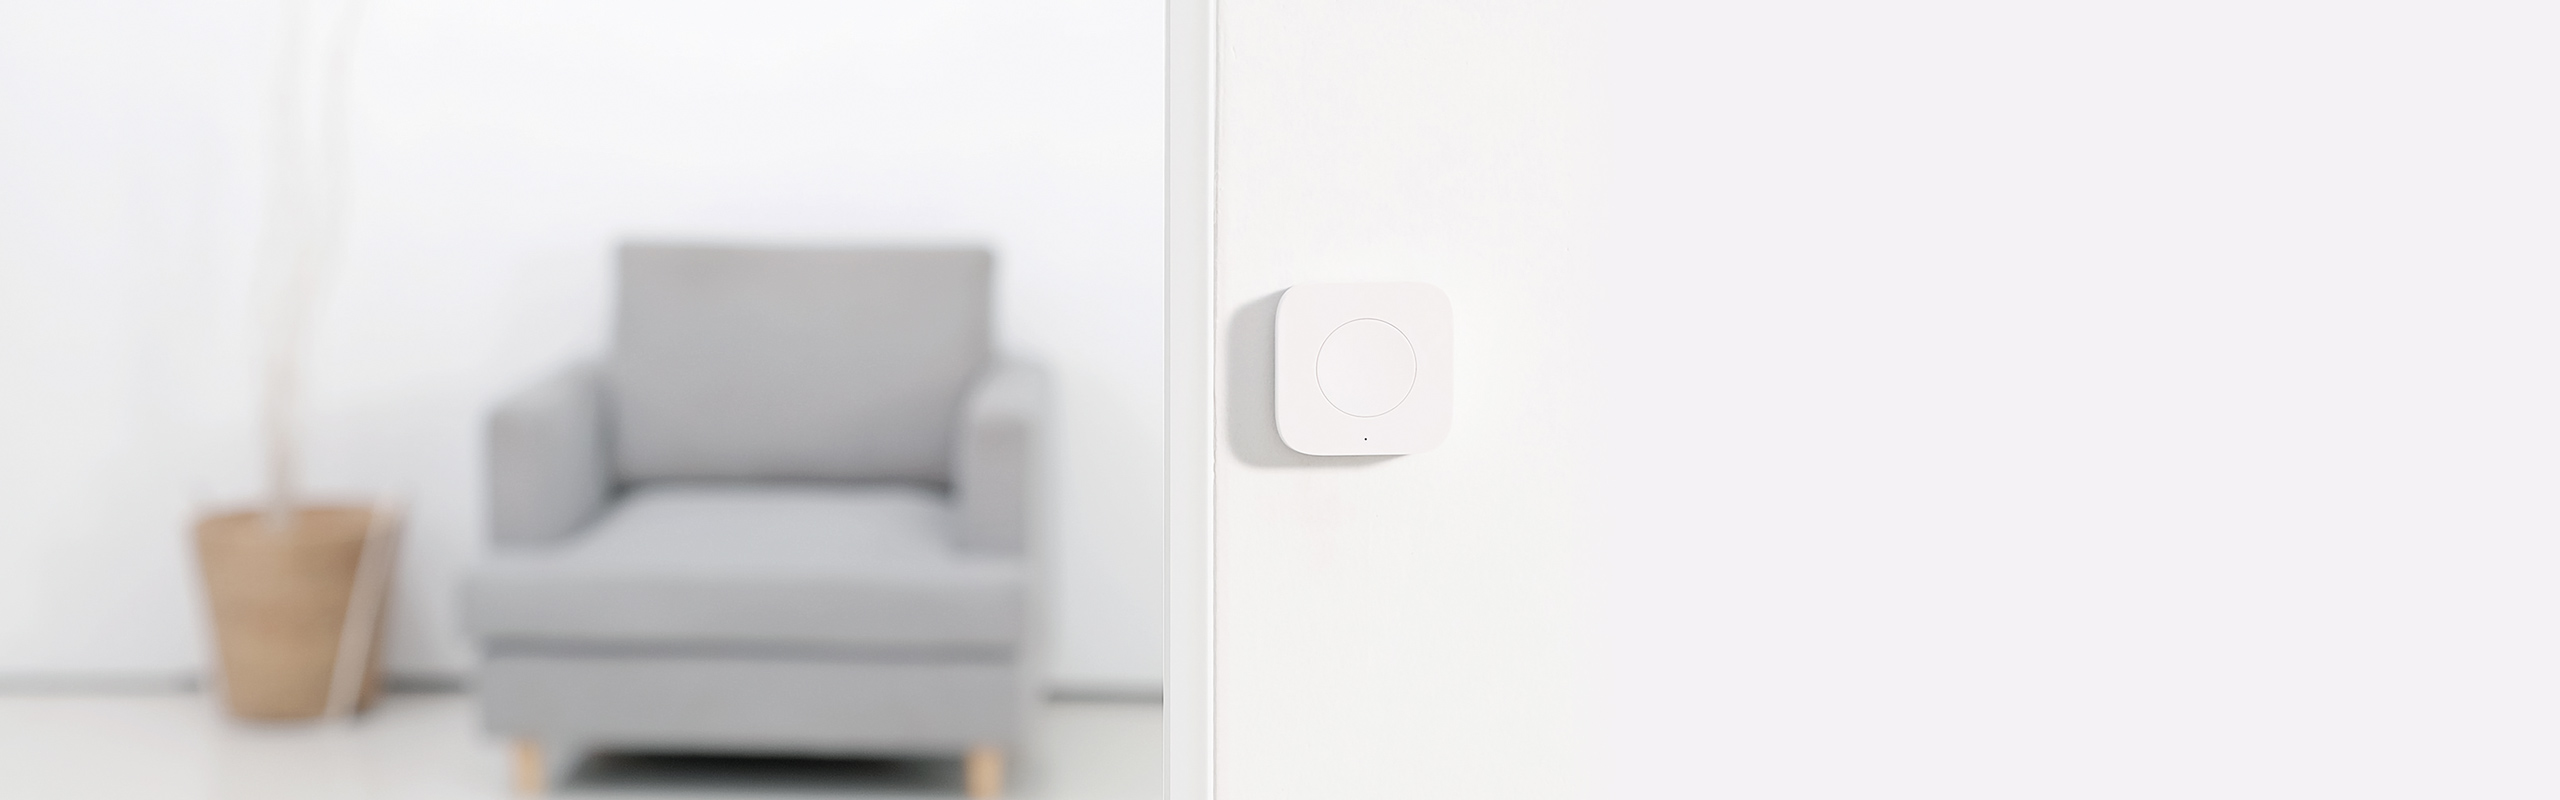 Aqara wireless mini switch - homekit remote switch for Aqara smart devices